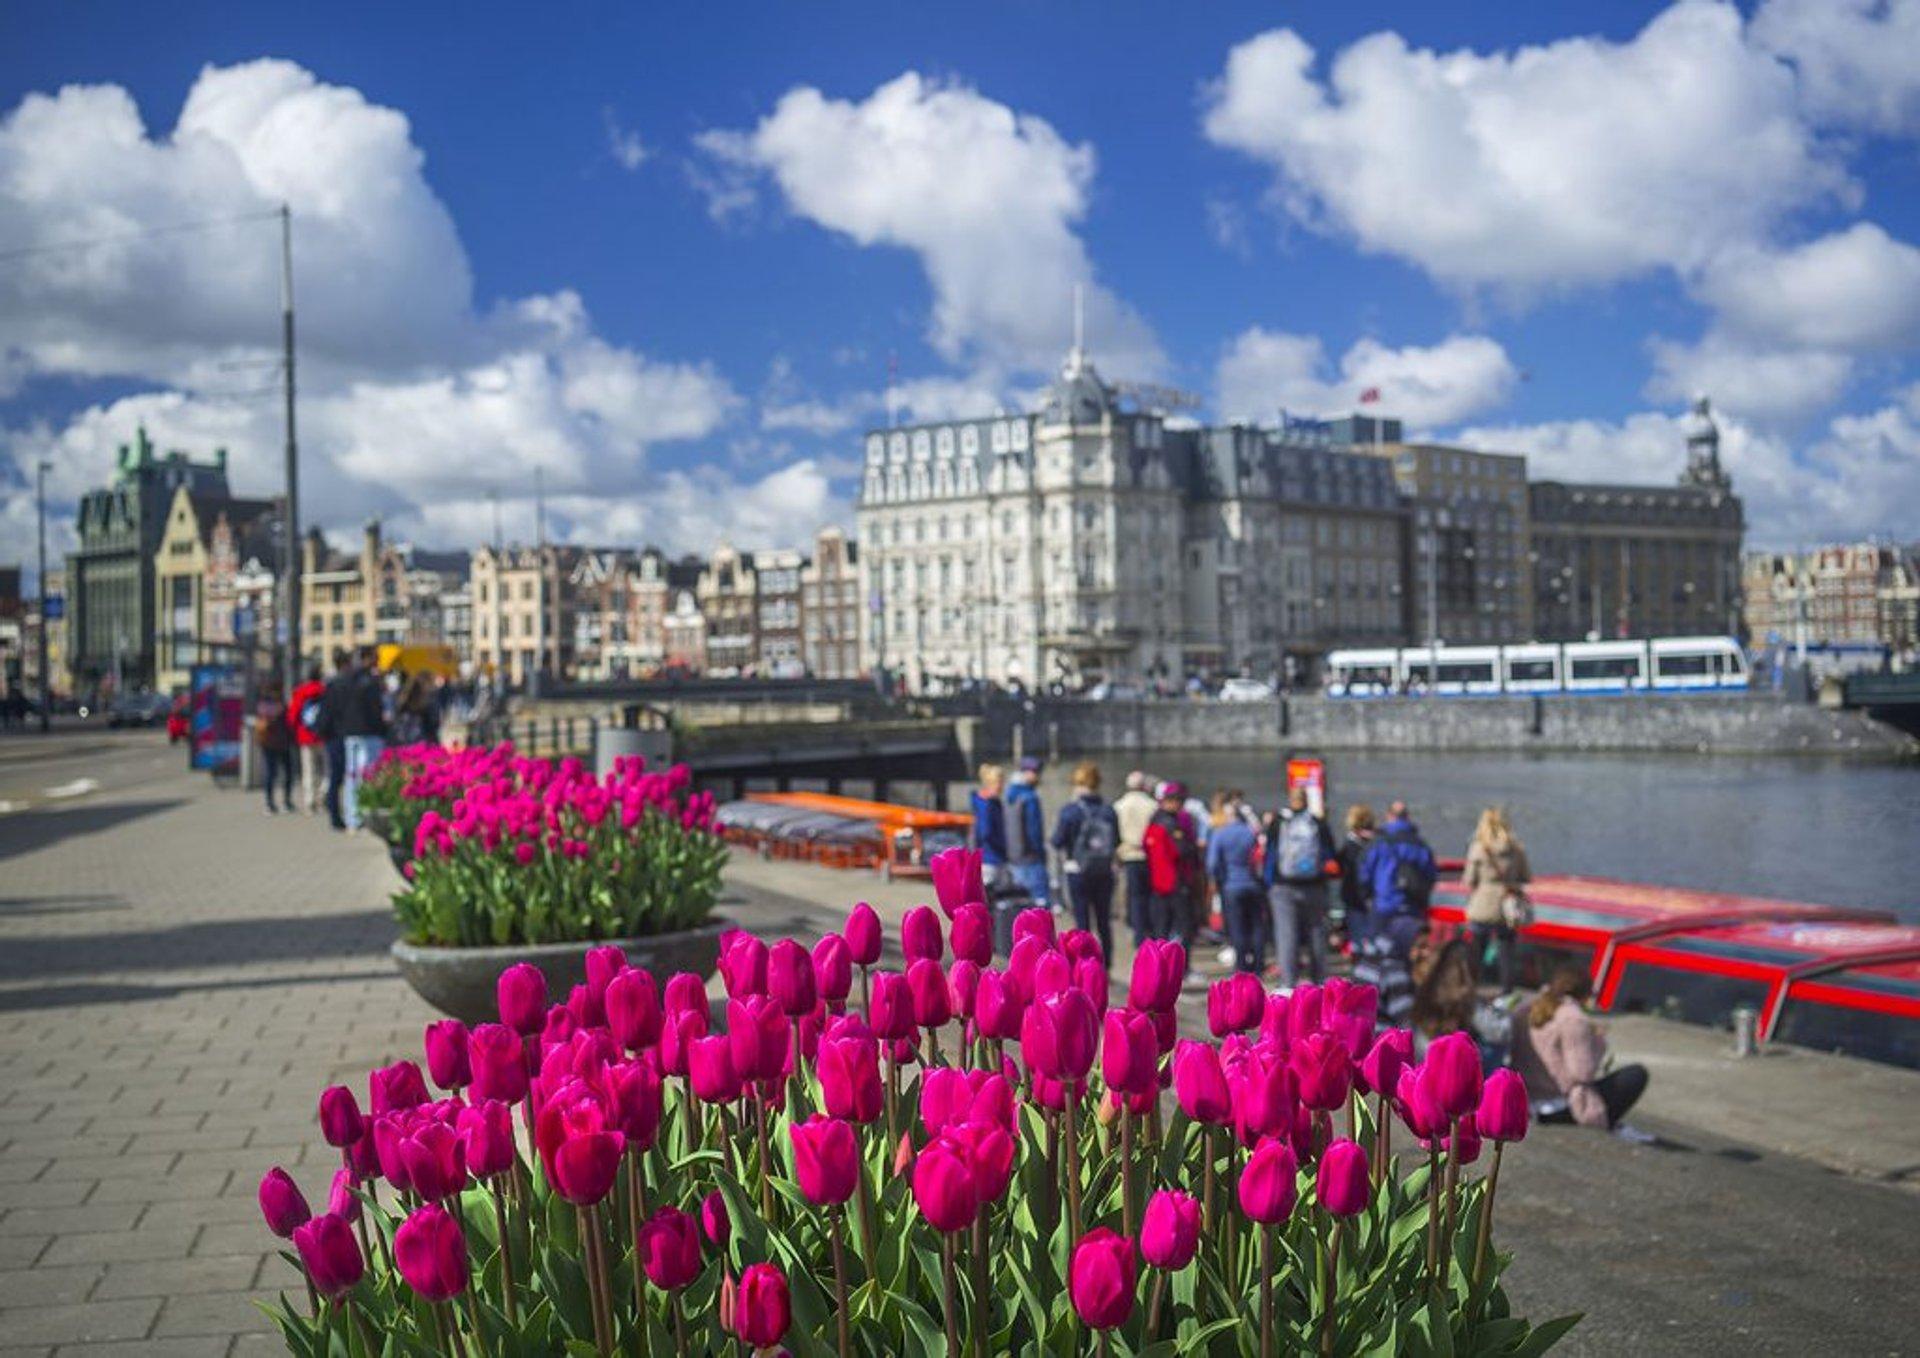 Tulp Festival (Amsterdam Tulip Festival) in Amsterdam - Best Season 2020